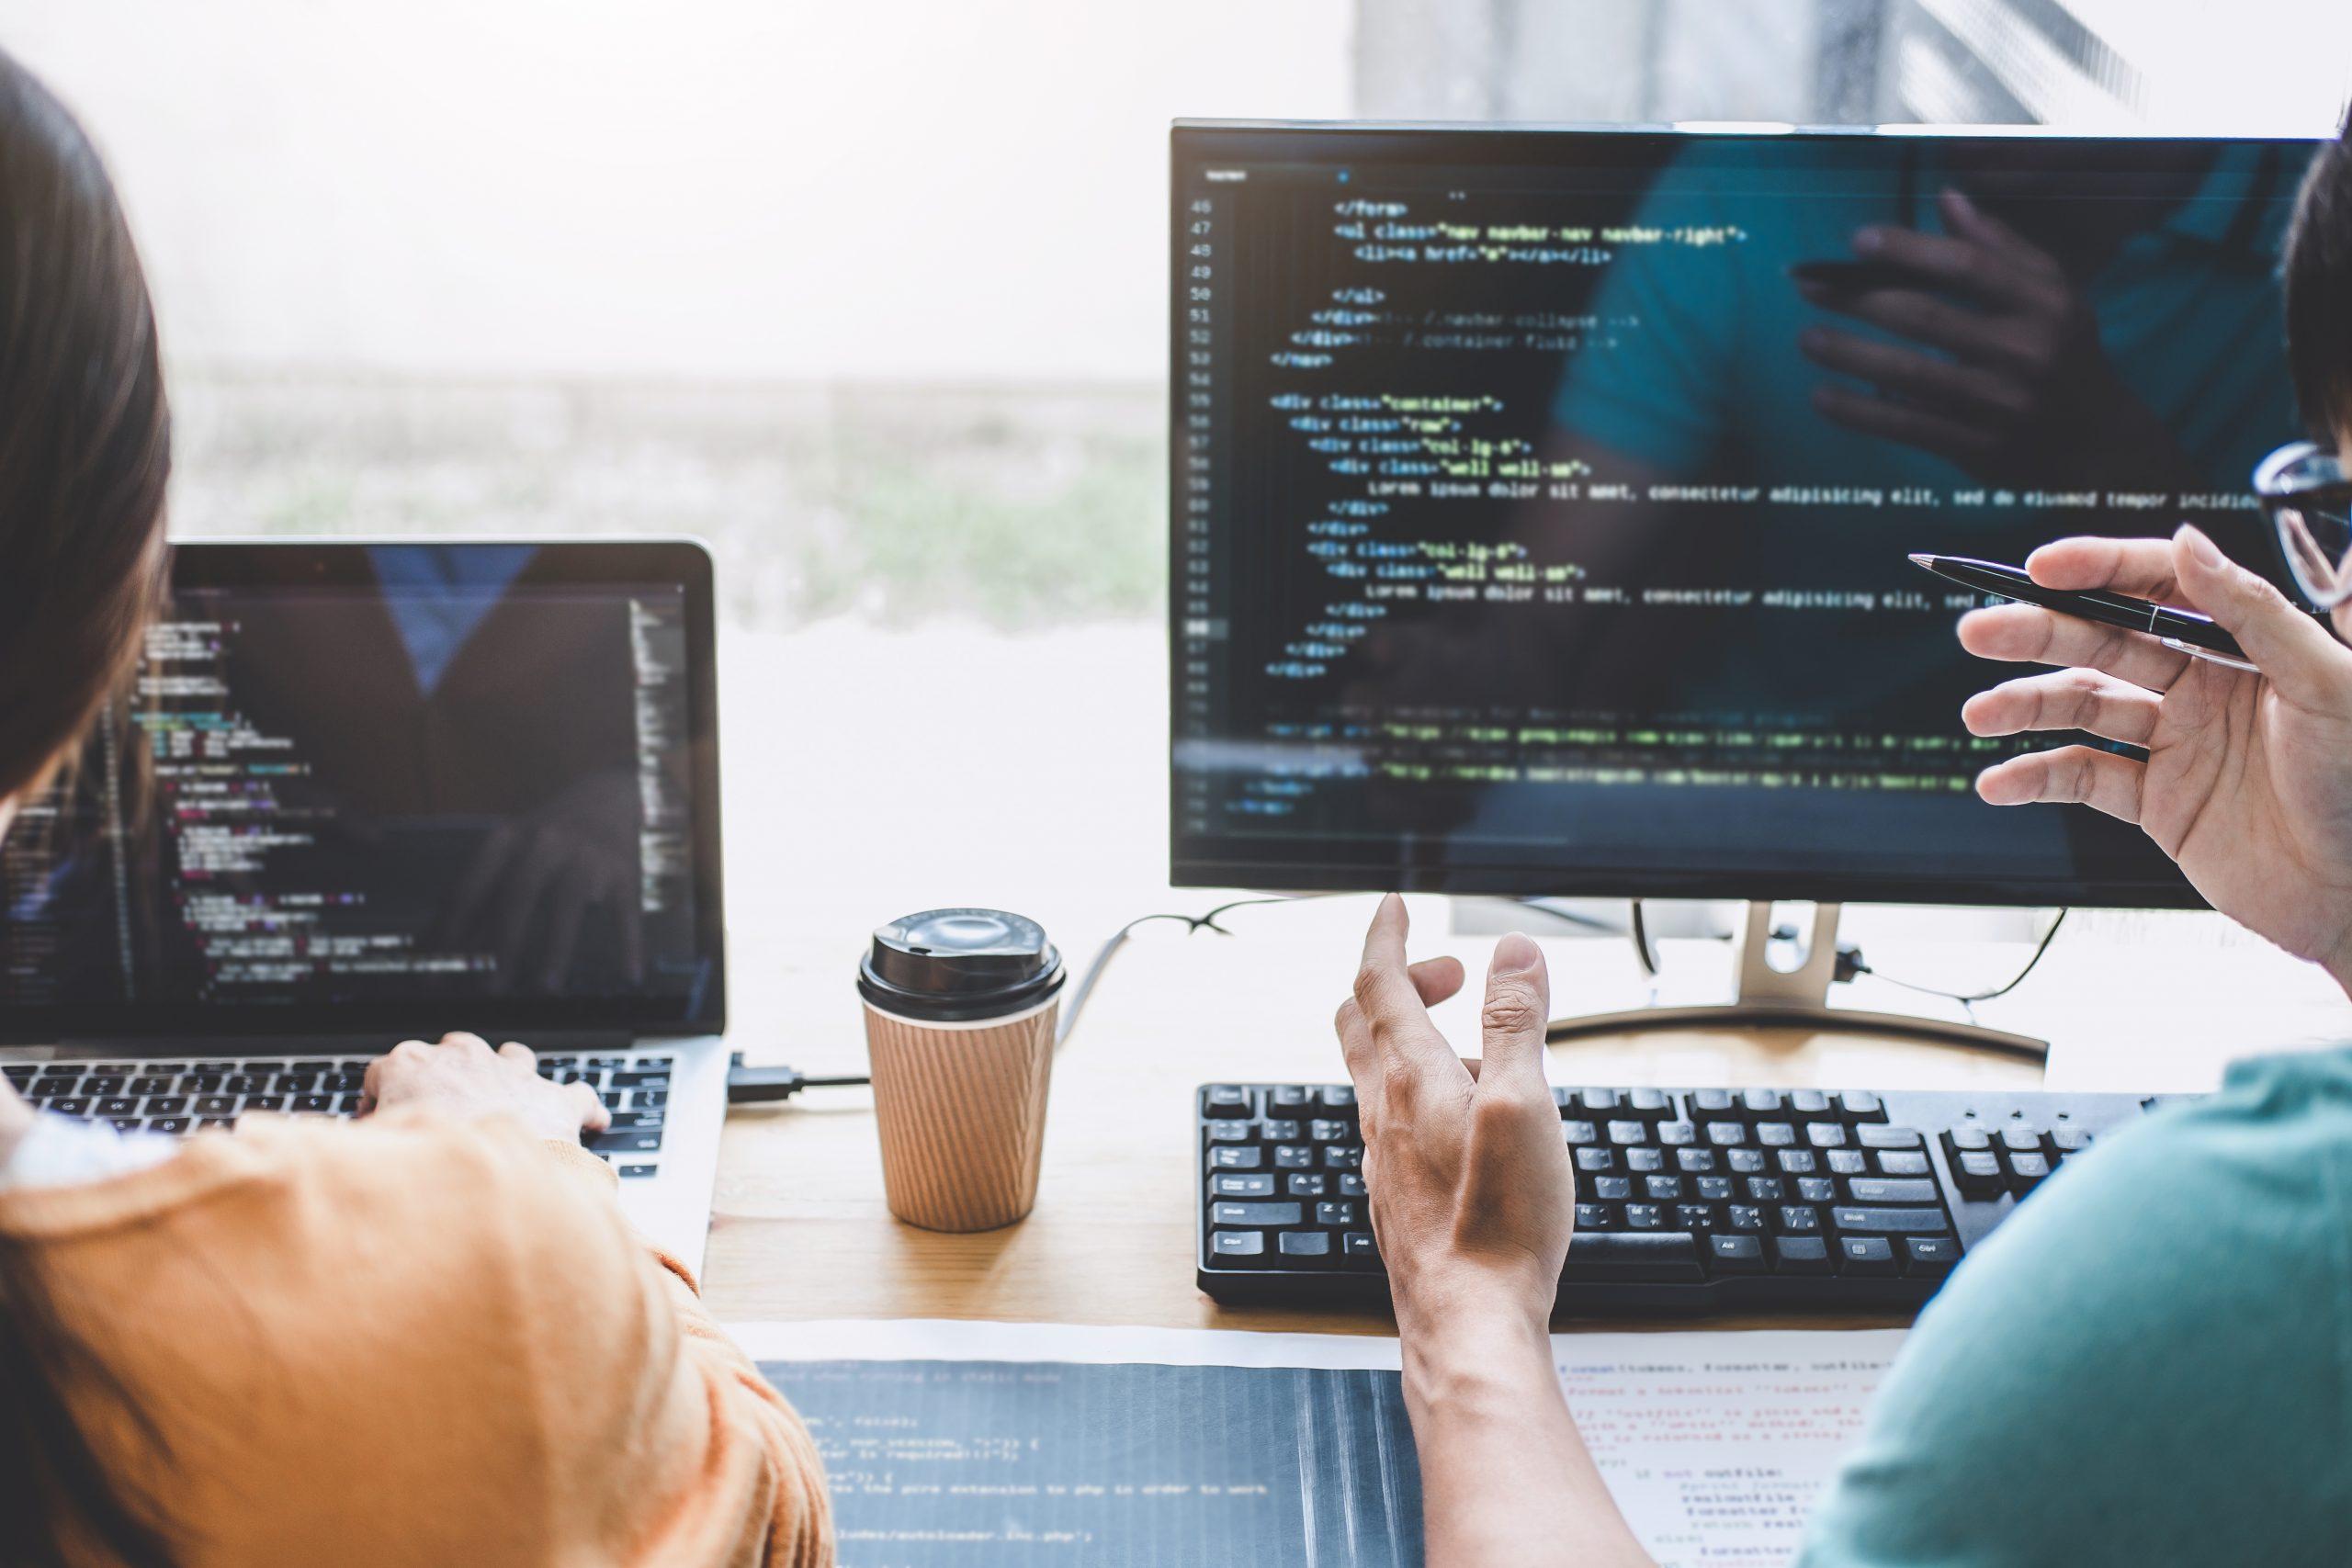 Taking care of code reusabilityvs. adhering to programming principles when writing code